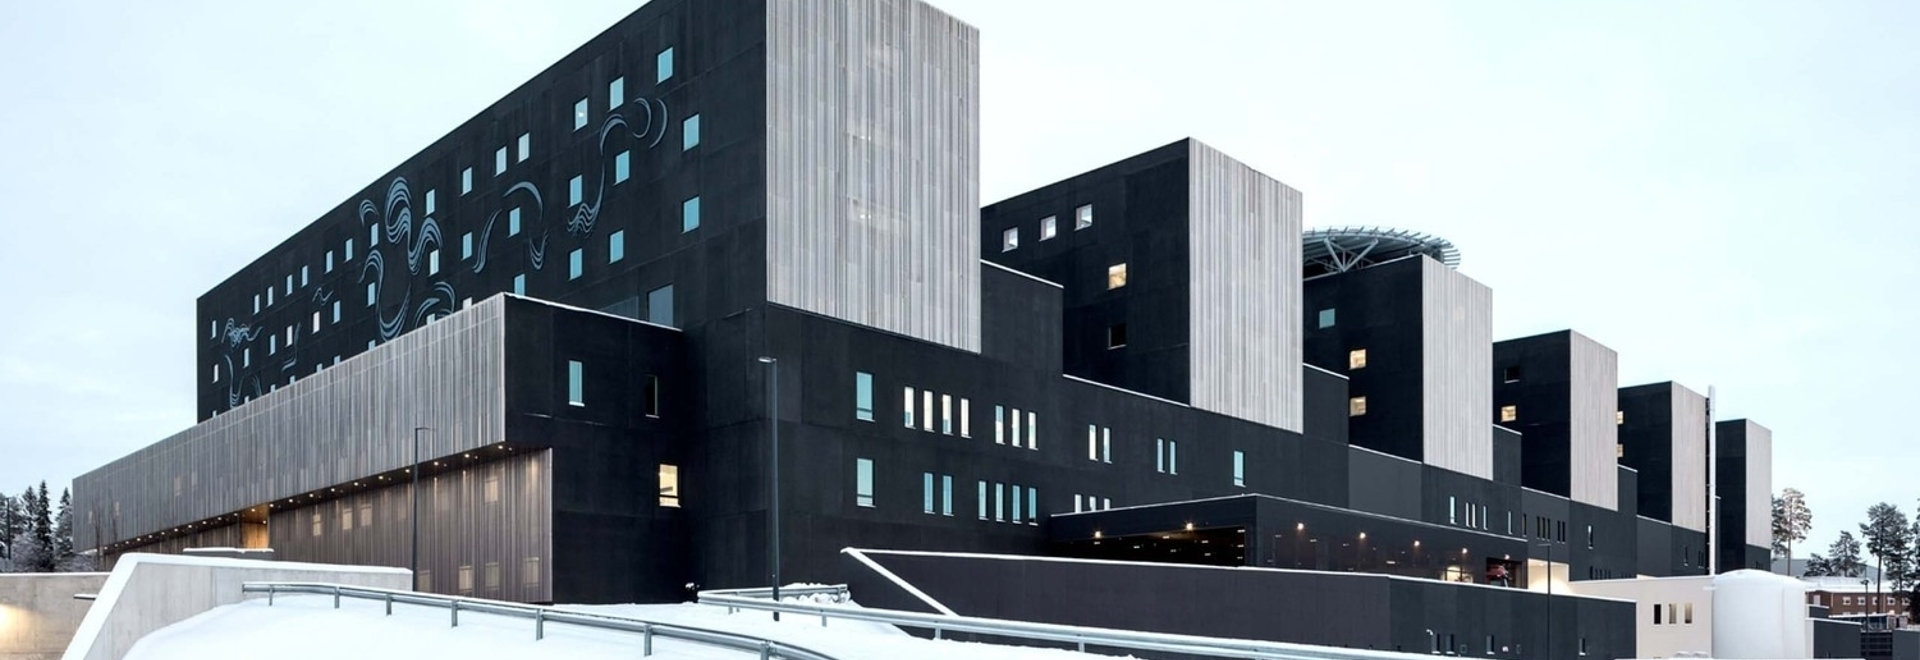 Hospital Nova / JKMM Architects